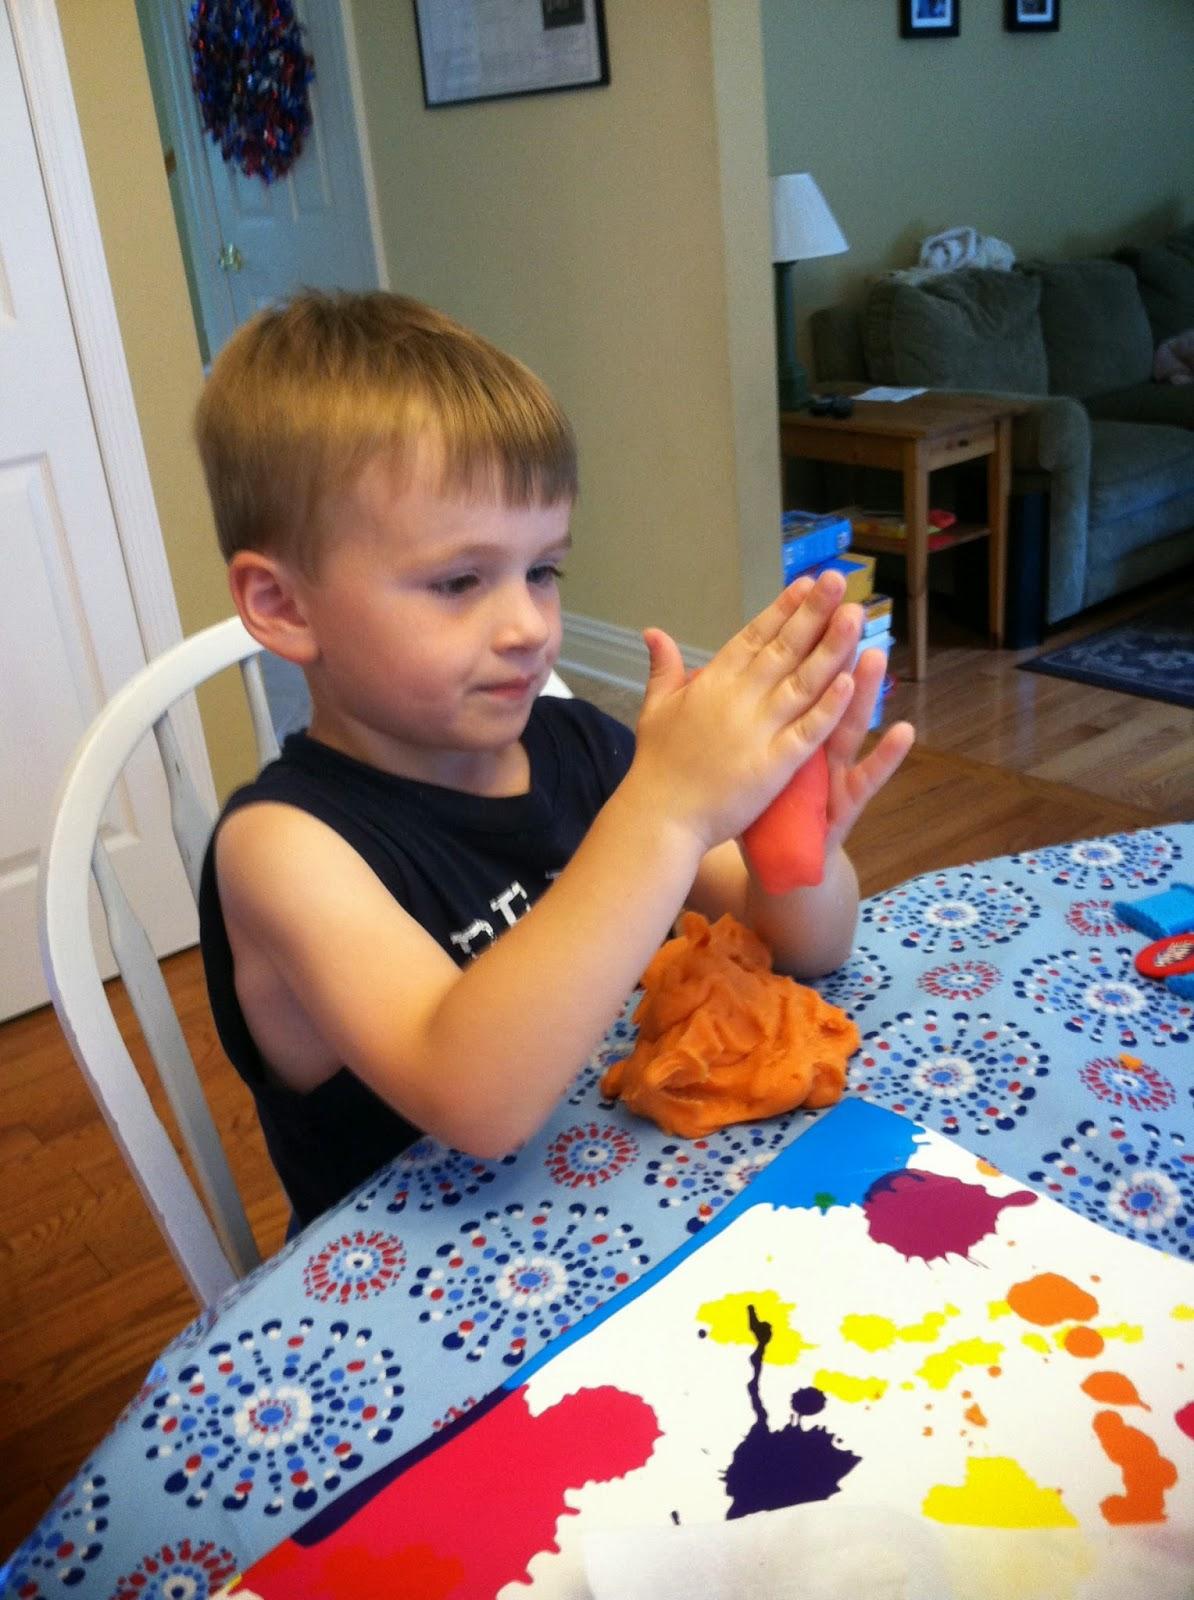 Diy Squishy Dough : The Jersey Momma: Easy DIY Squishy Play Dough